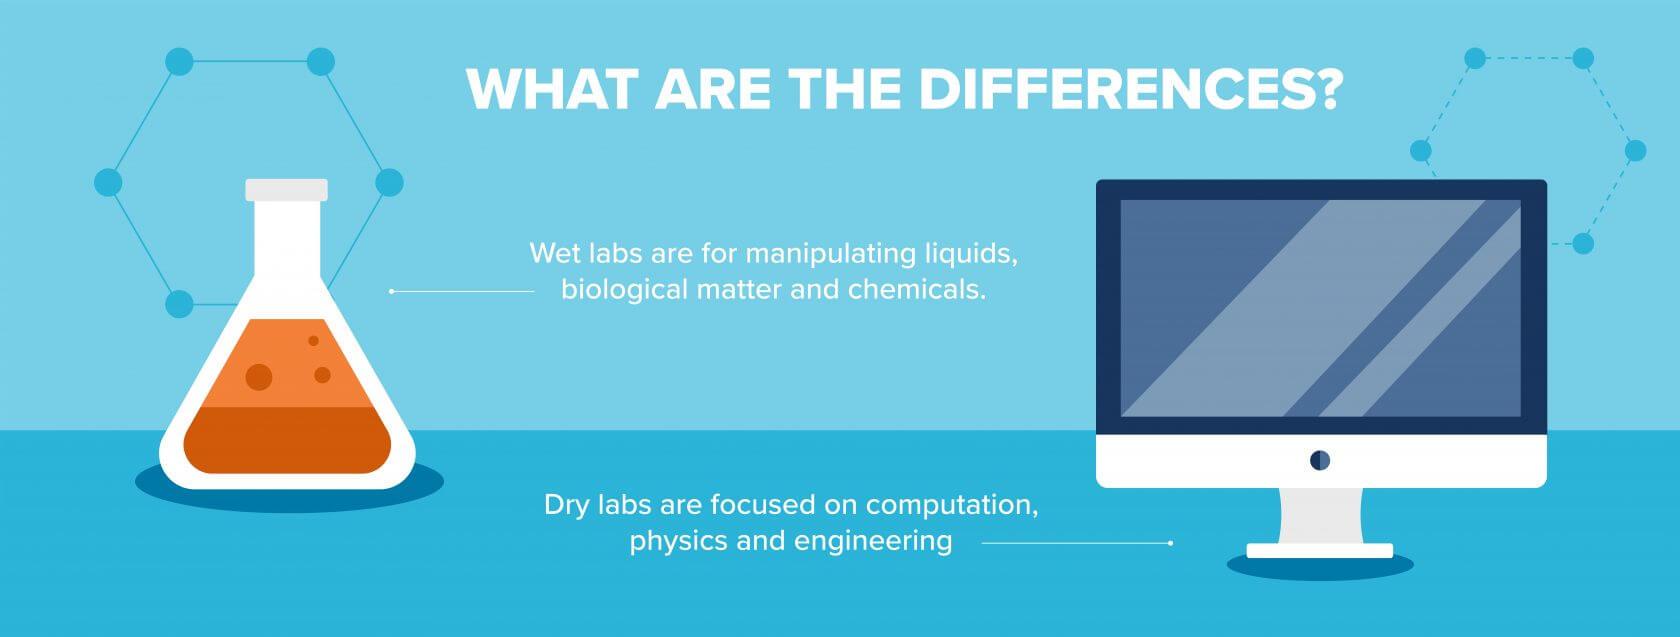 Wet Lab vs Dry Lab Differences